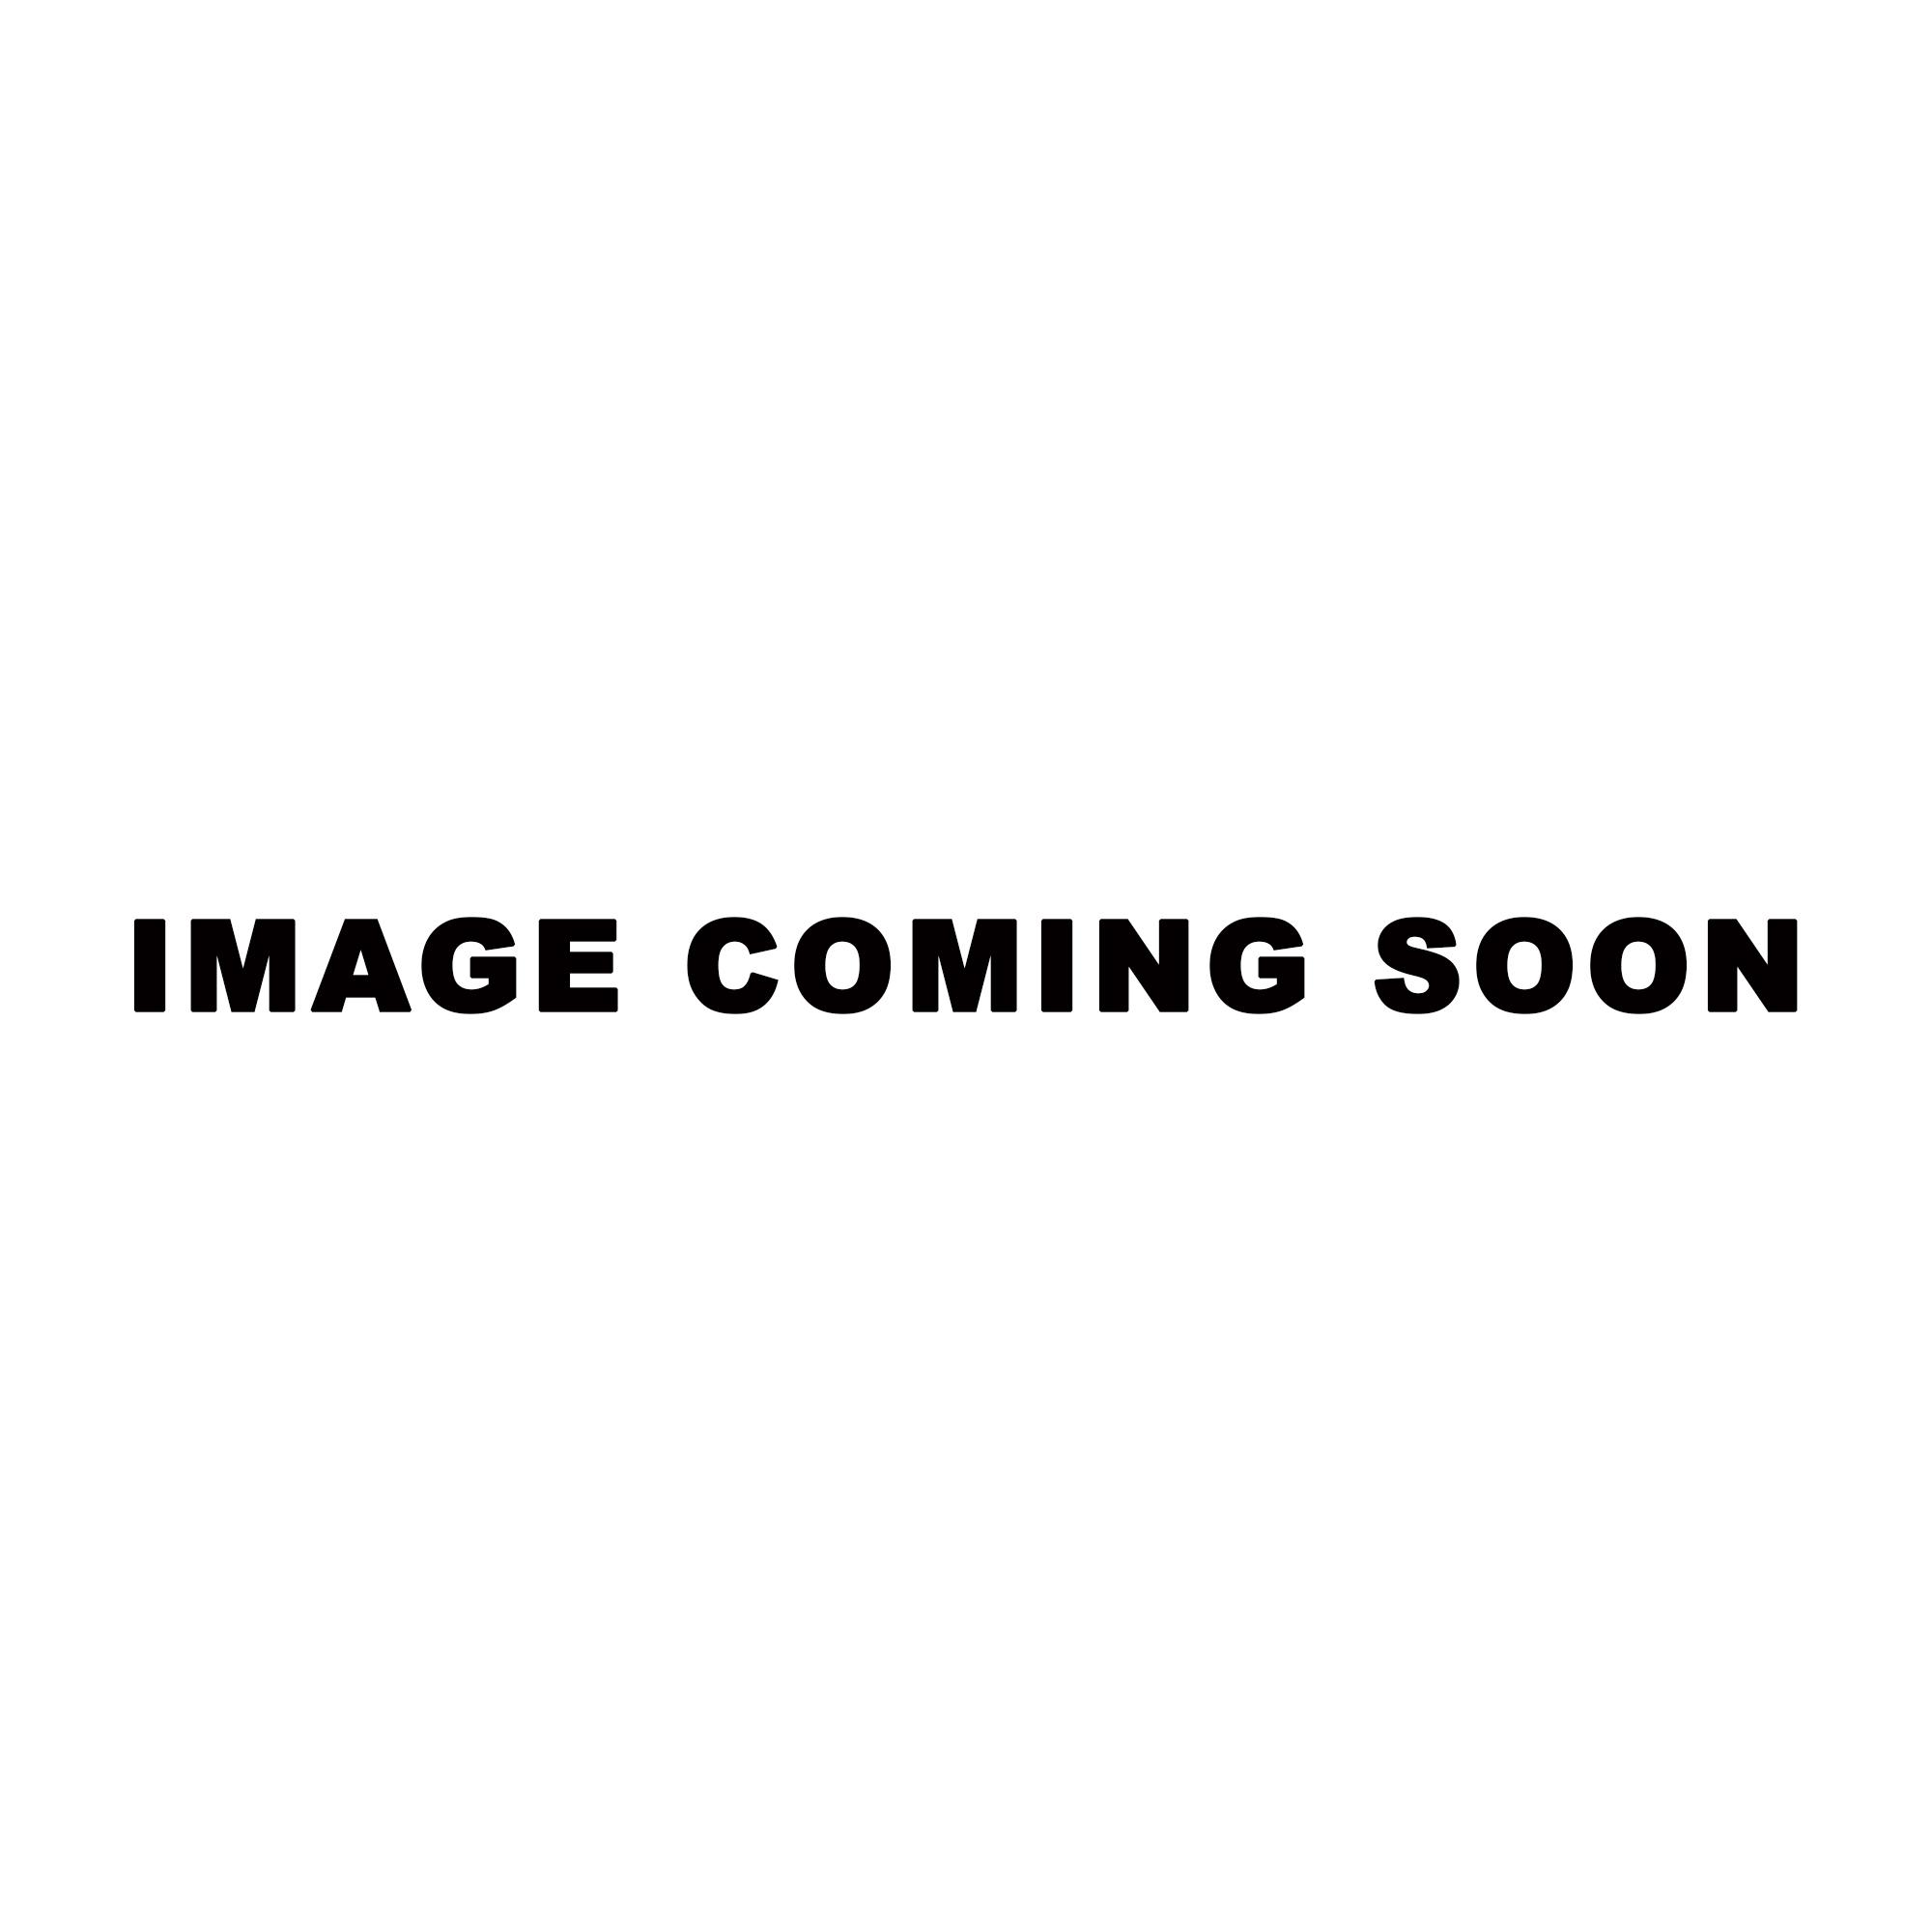 Jackie Robinson Brooklyn Dodgers Big Tall Cooperstown